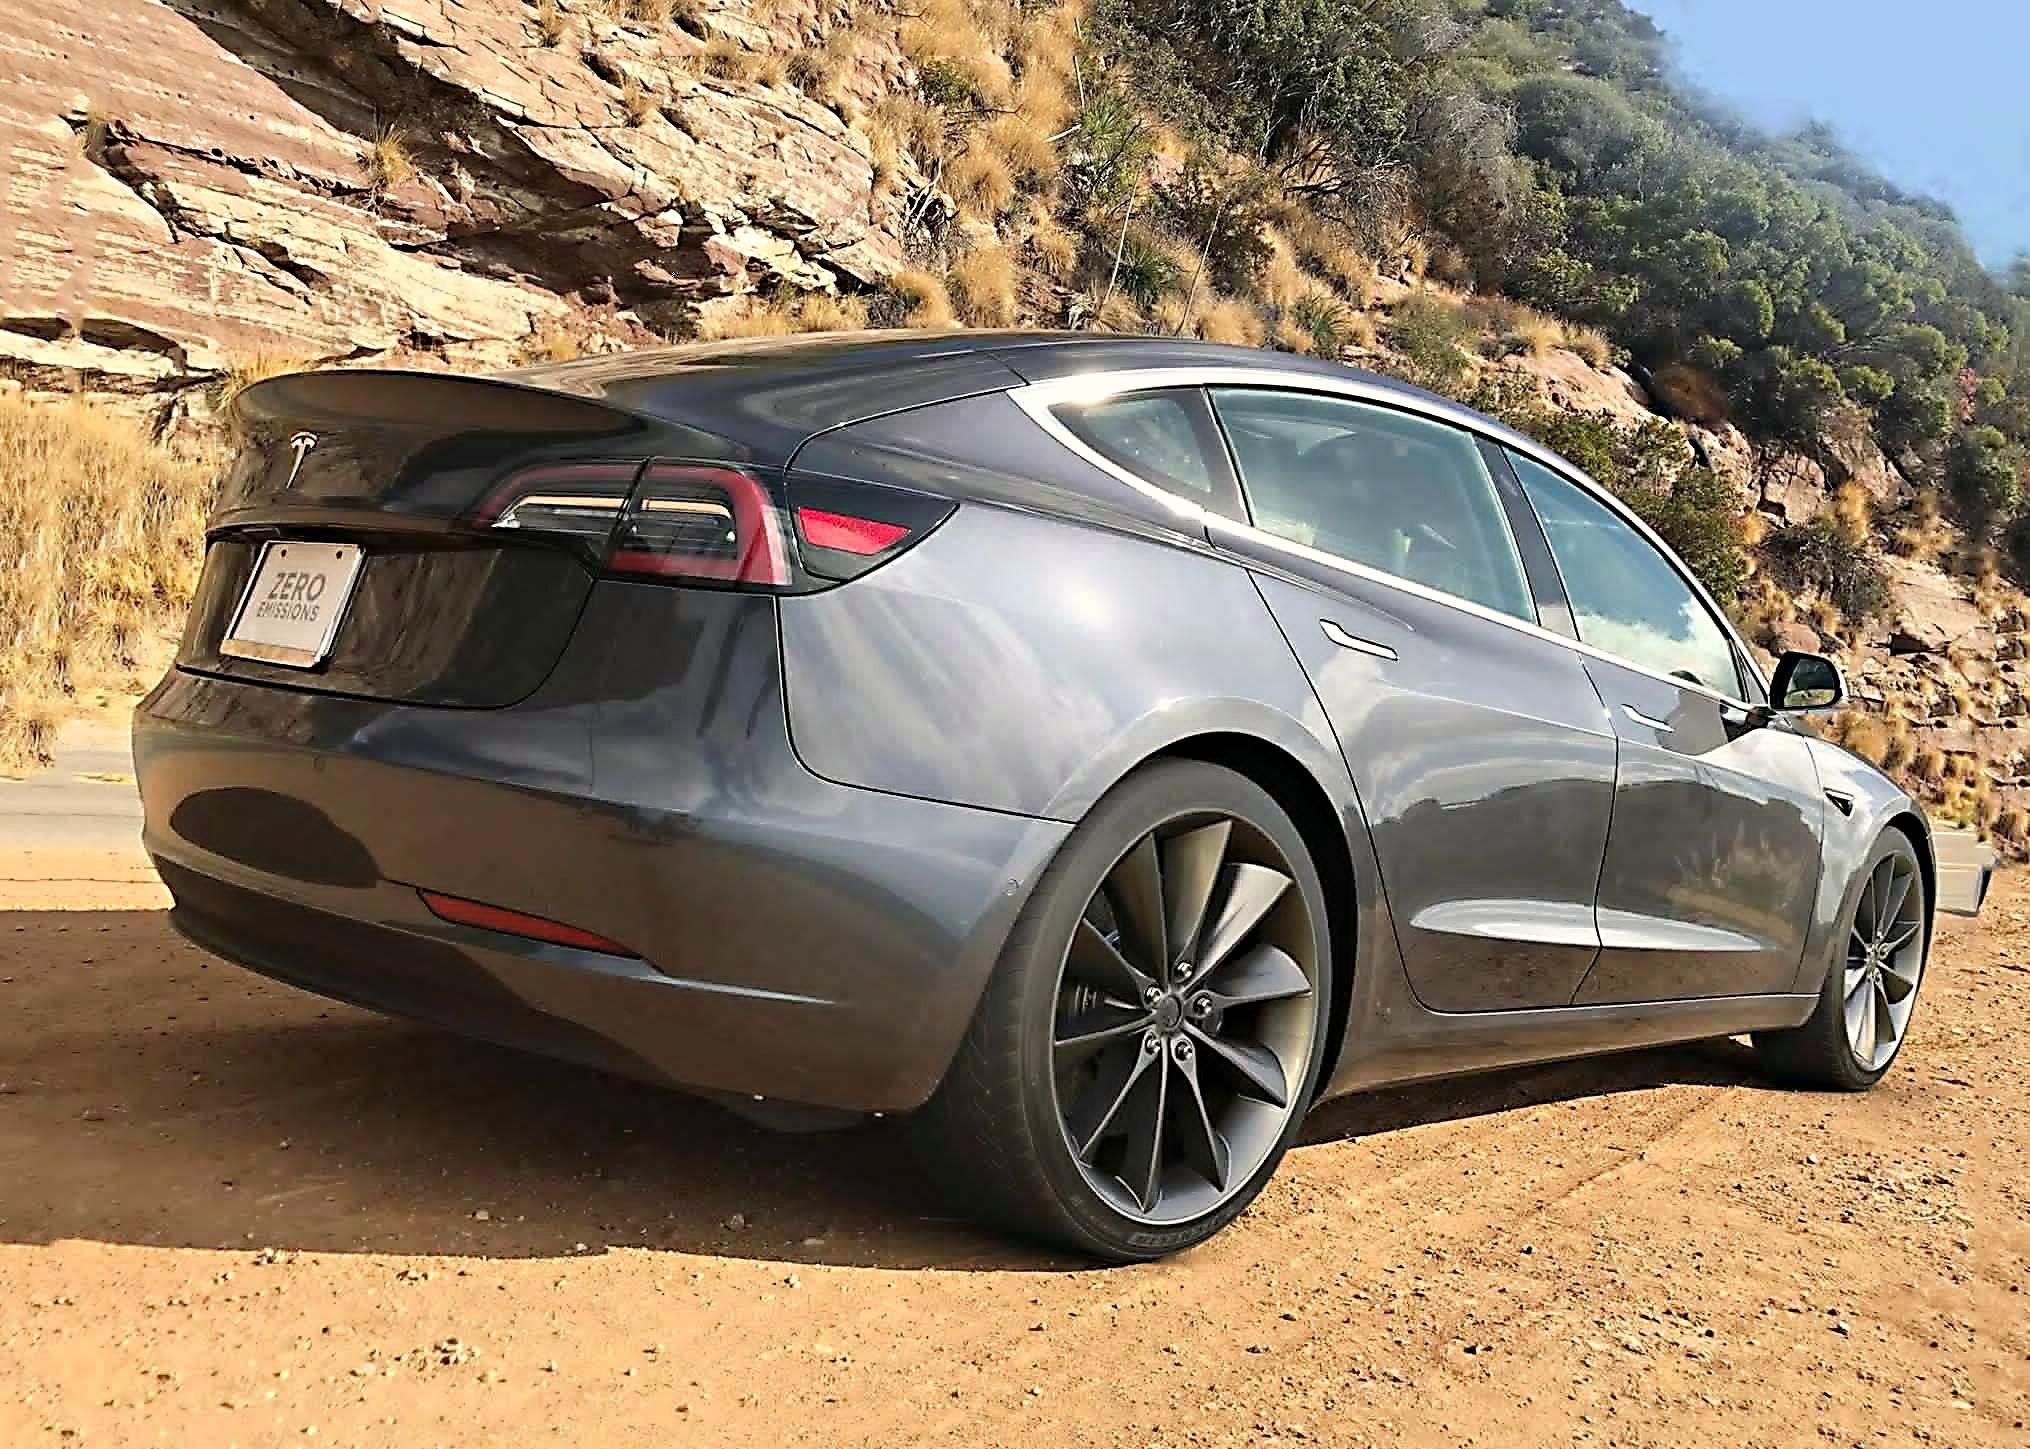 EV_Wheel_Direct_EVT_Wheel_for_Tesla_Model_3_-_REAR